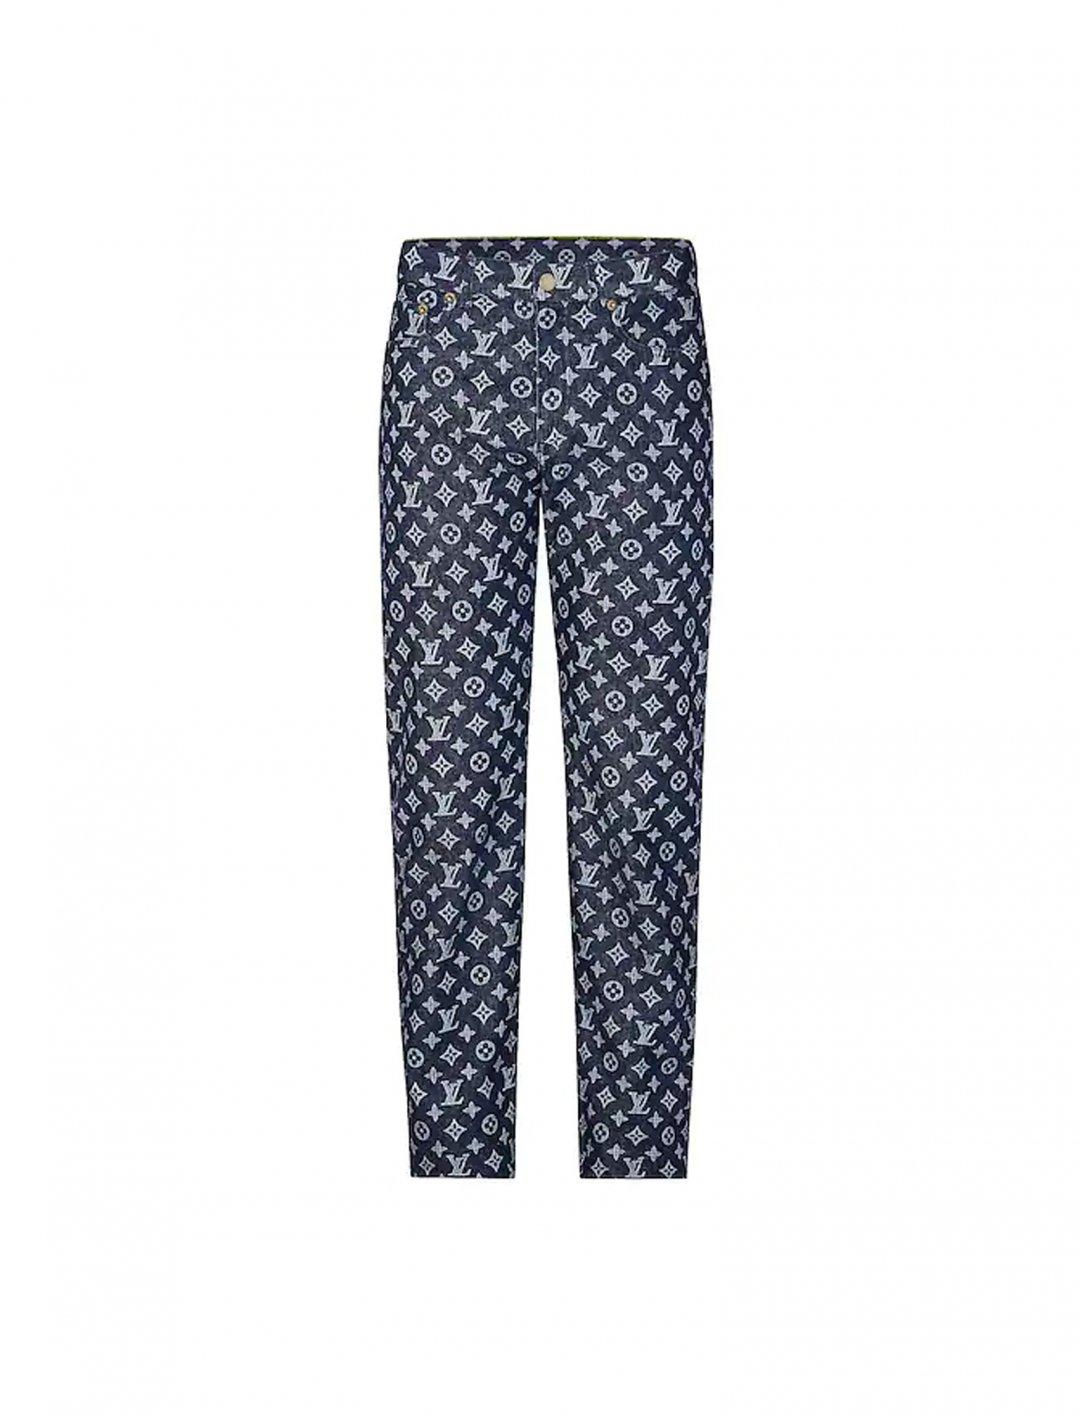 Not3s' Monogram Regular Jeans Clothing Louis Vuitton